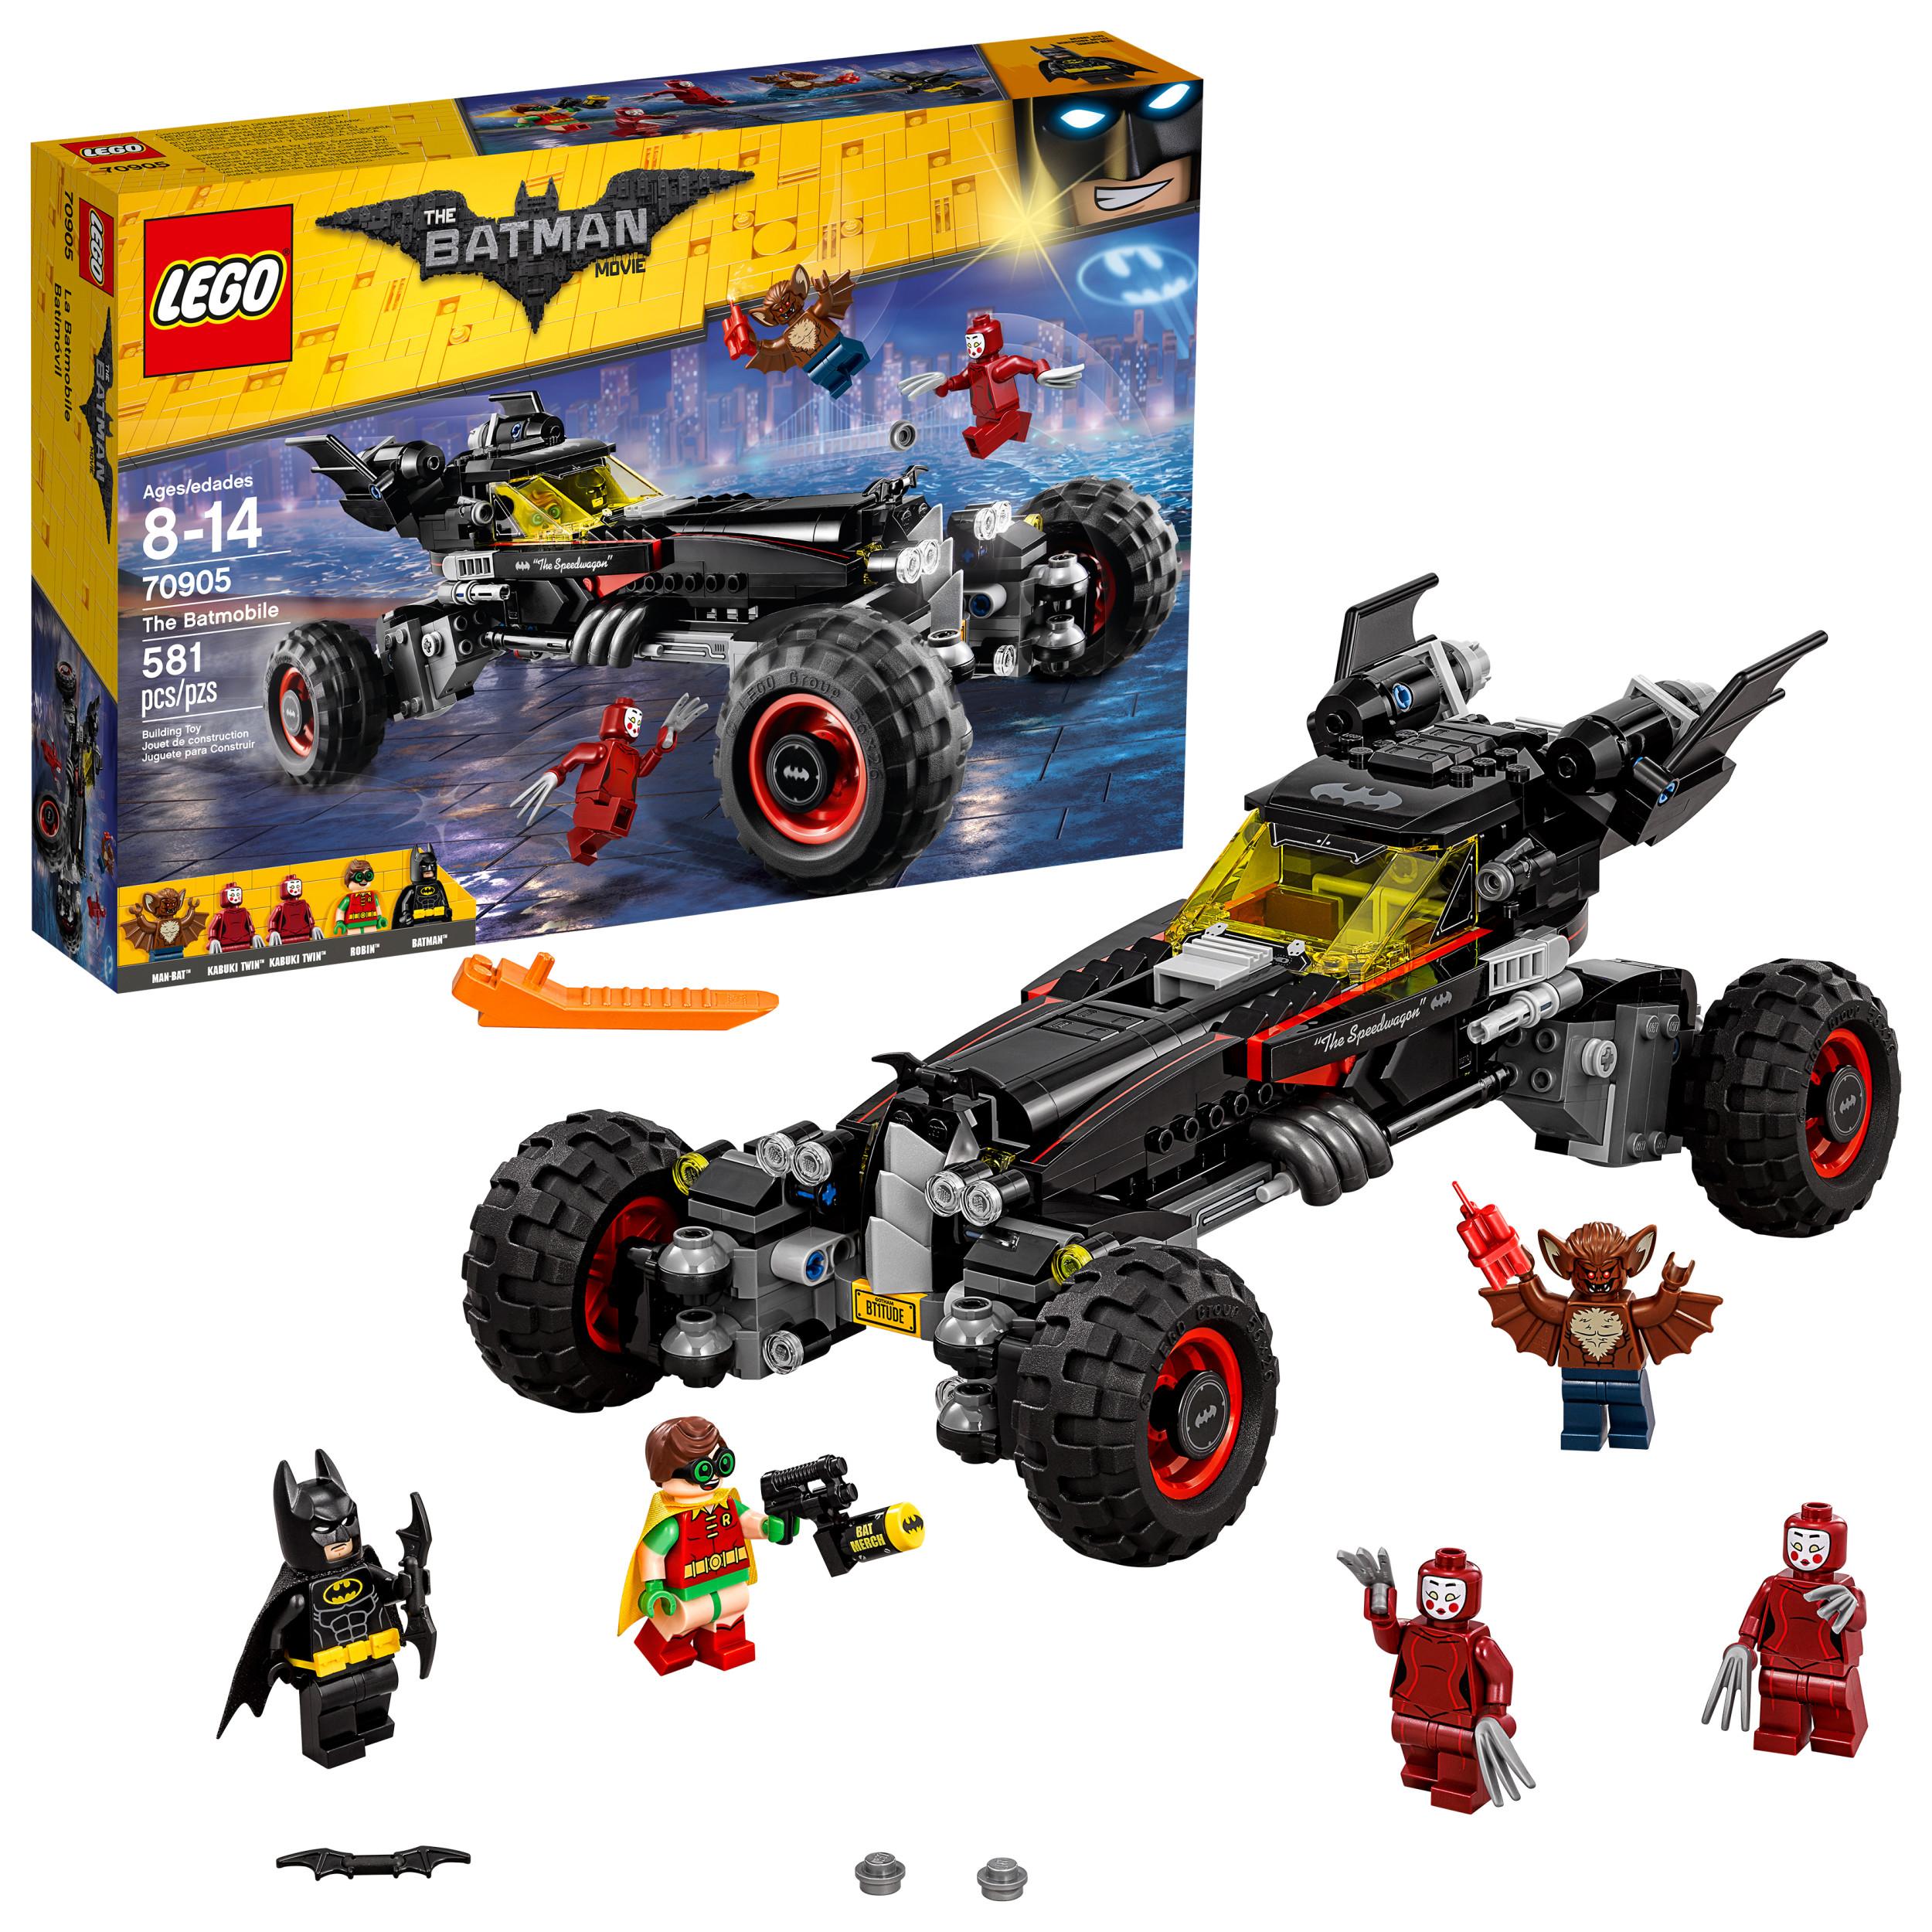 LEGO Batman Movie The Batmobile 70905 (581 Pieces)